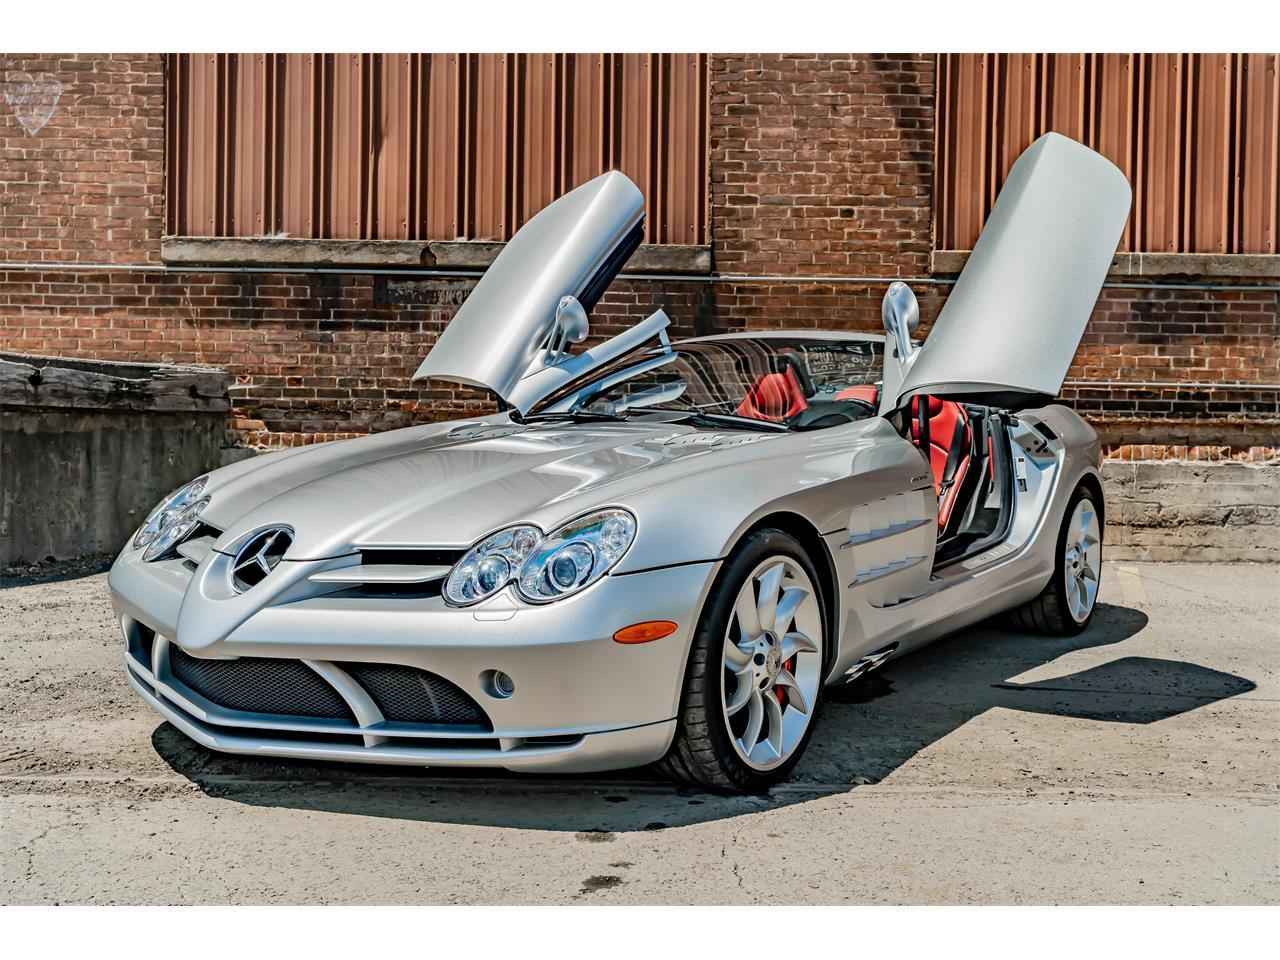 2008 Mercedes-Benz SLR McLaren for Sale   ClassicCars.com ...